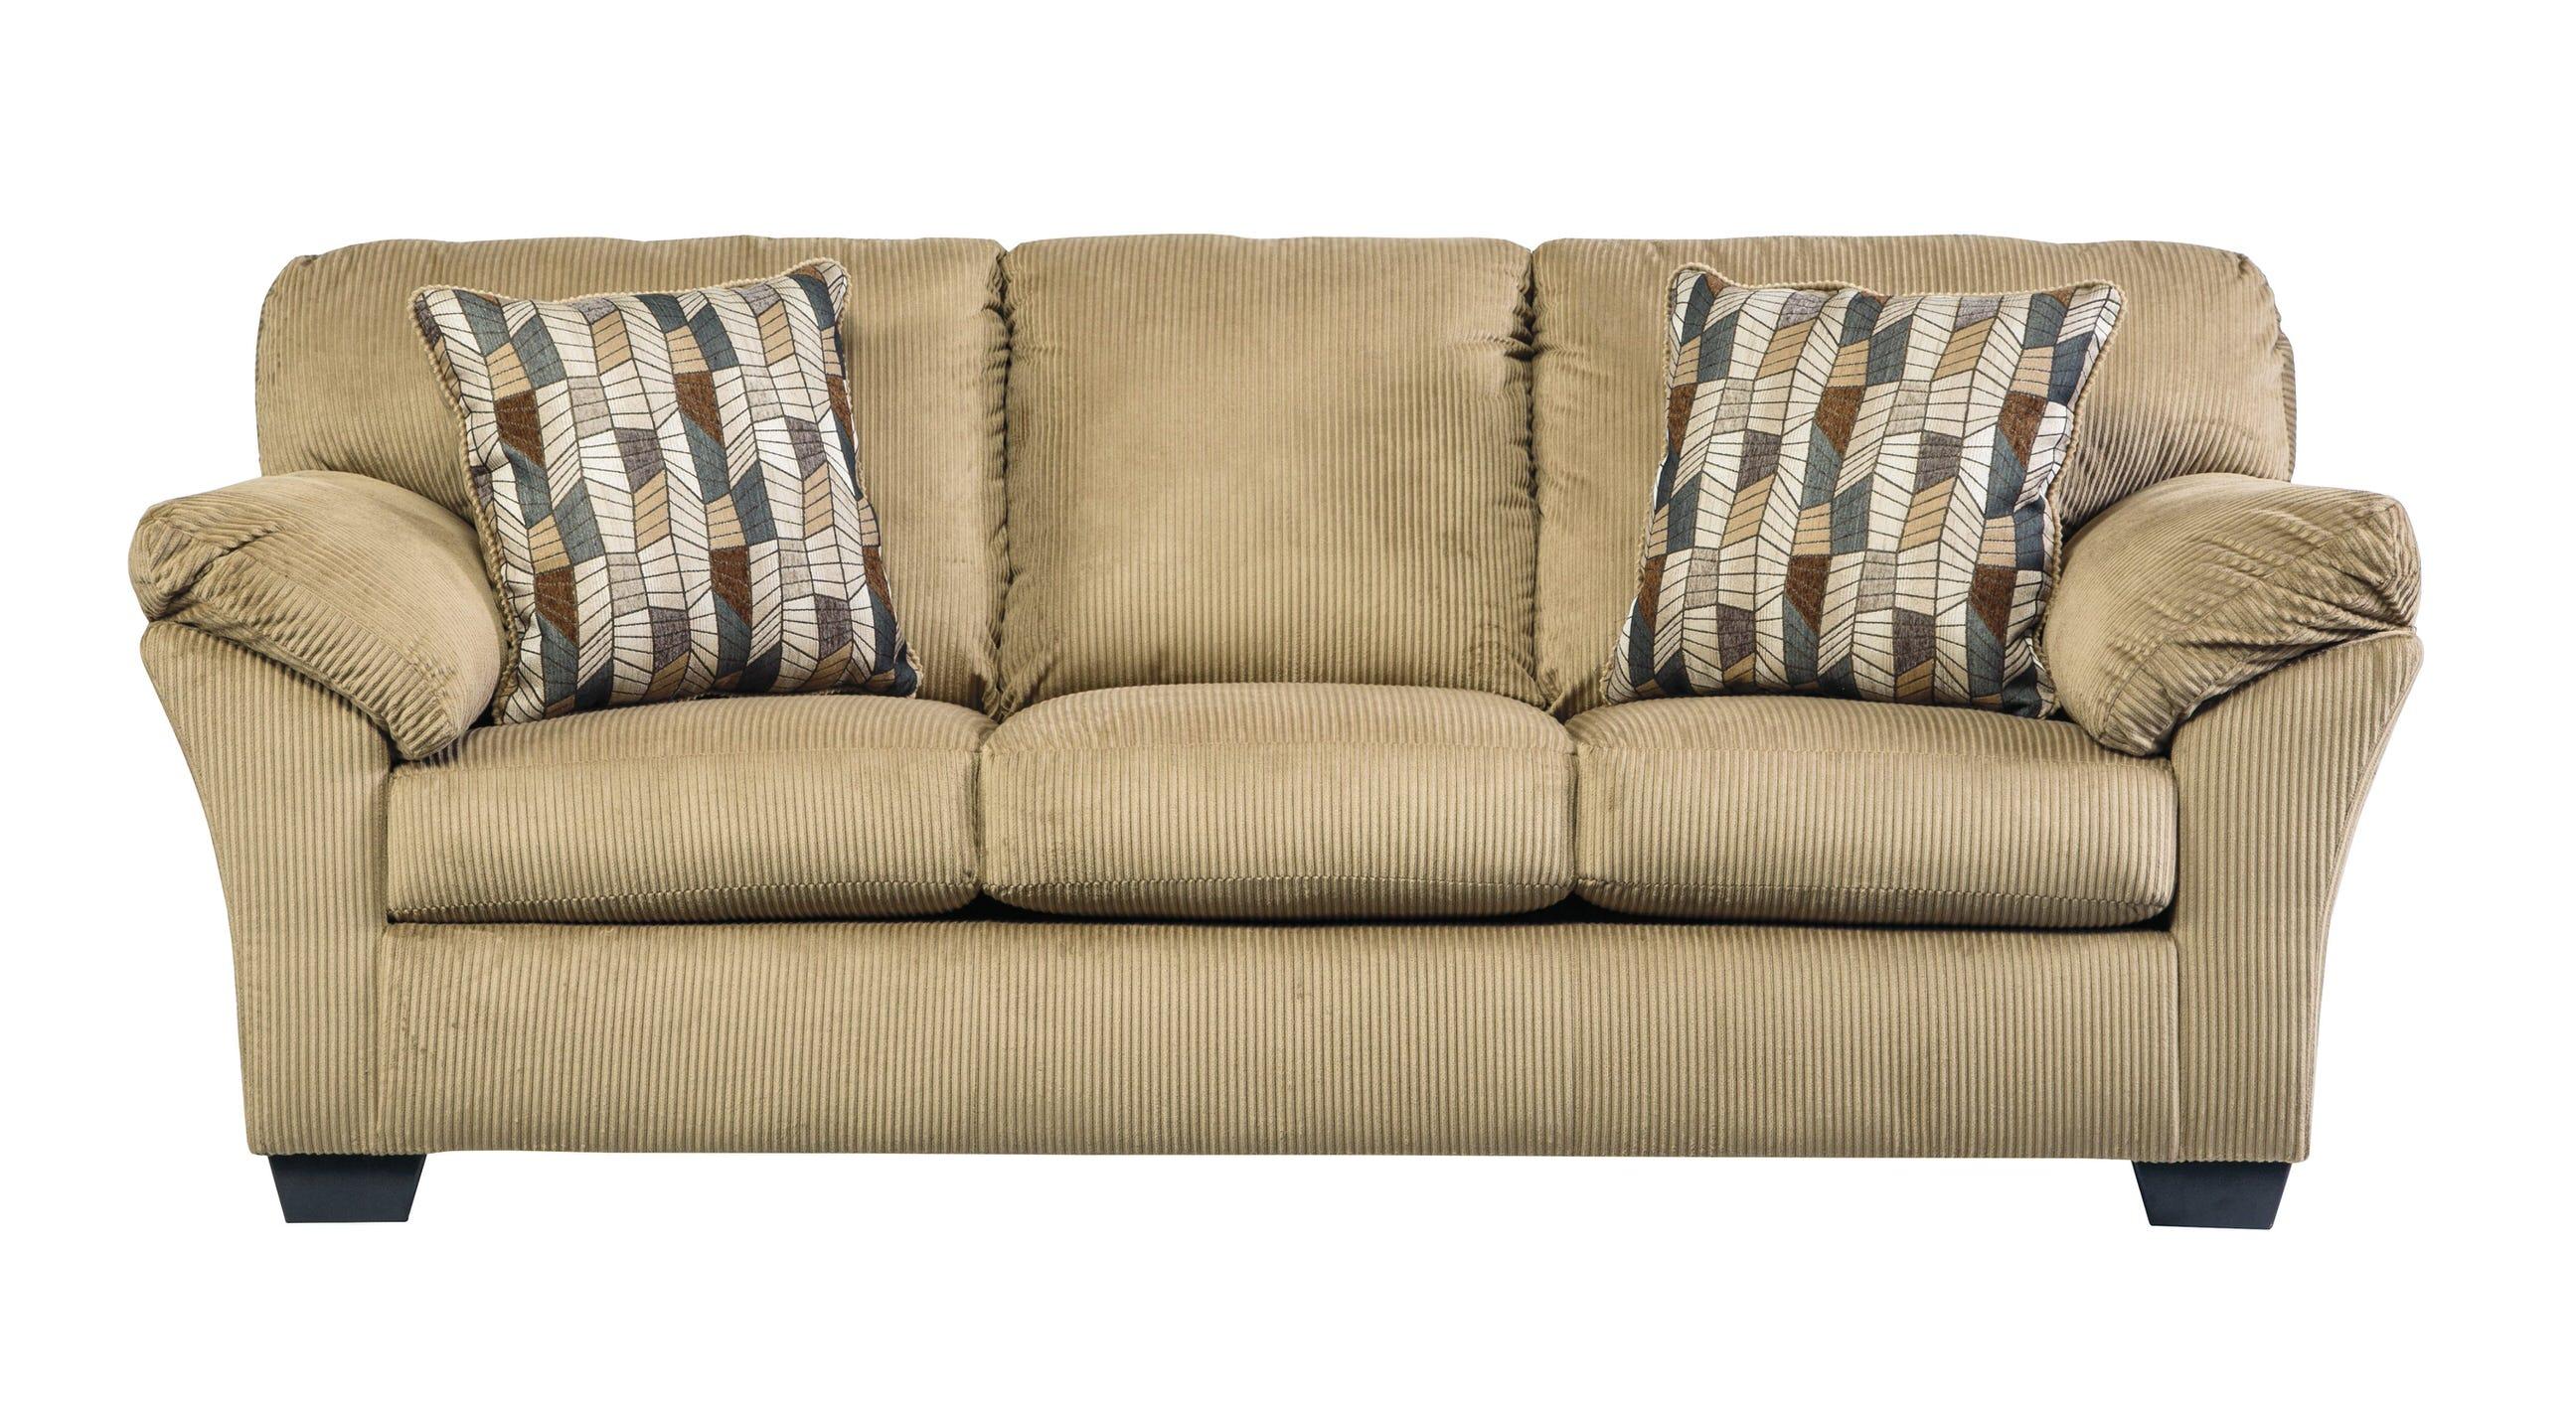 ashley furniture morandi mocha sofa dillards sofas bernhardt aluria contemporary